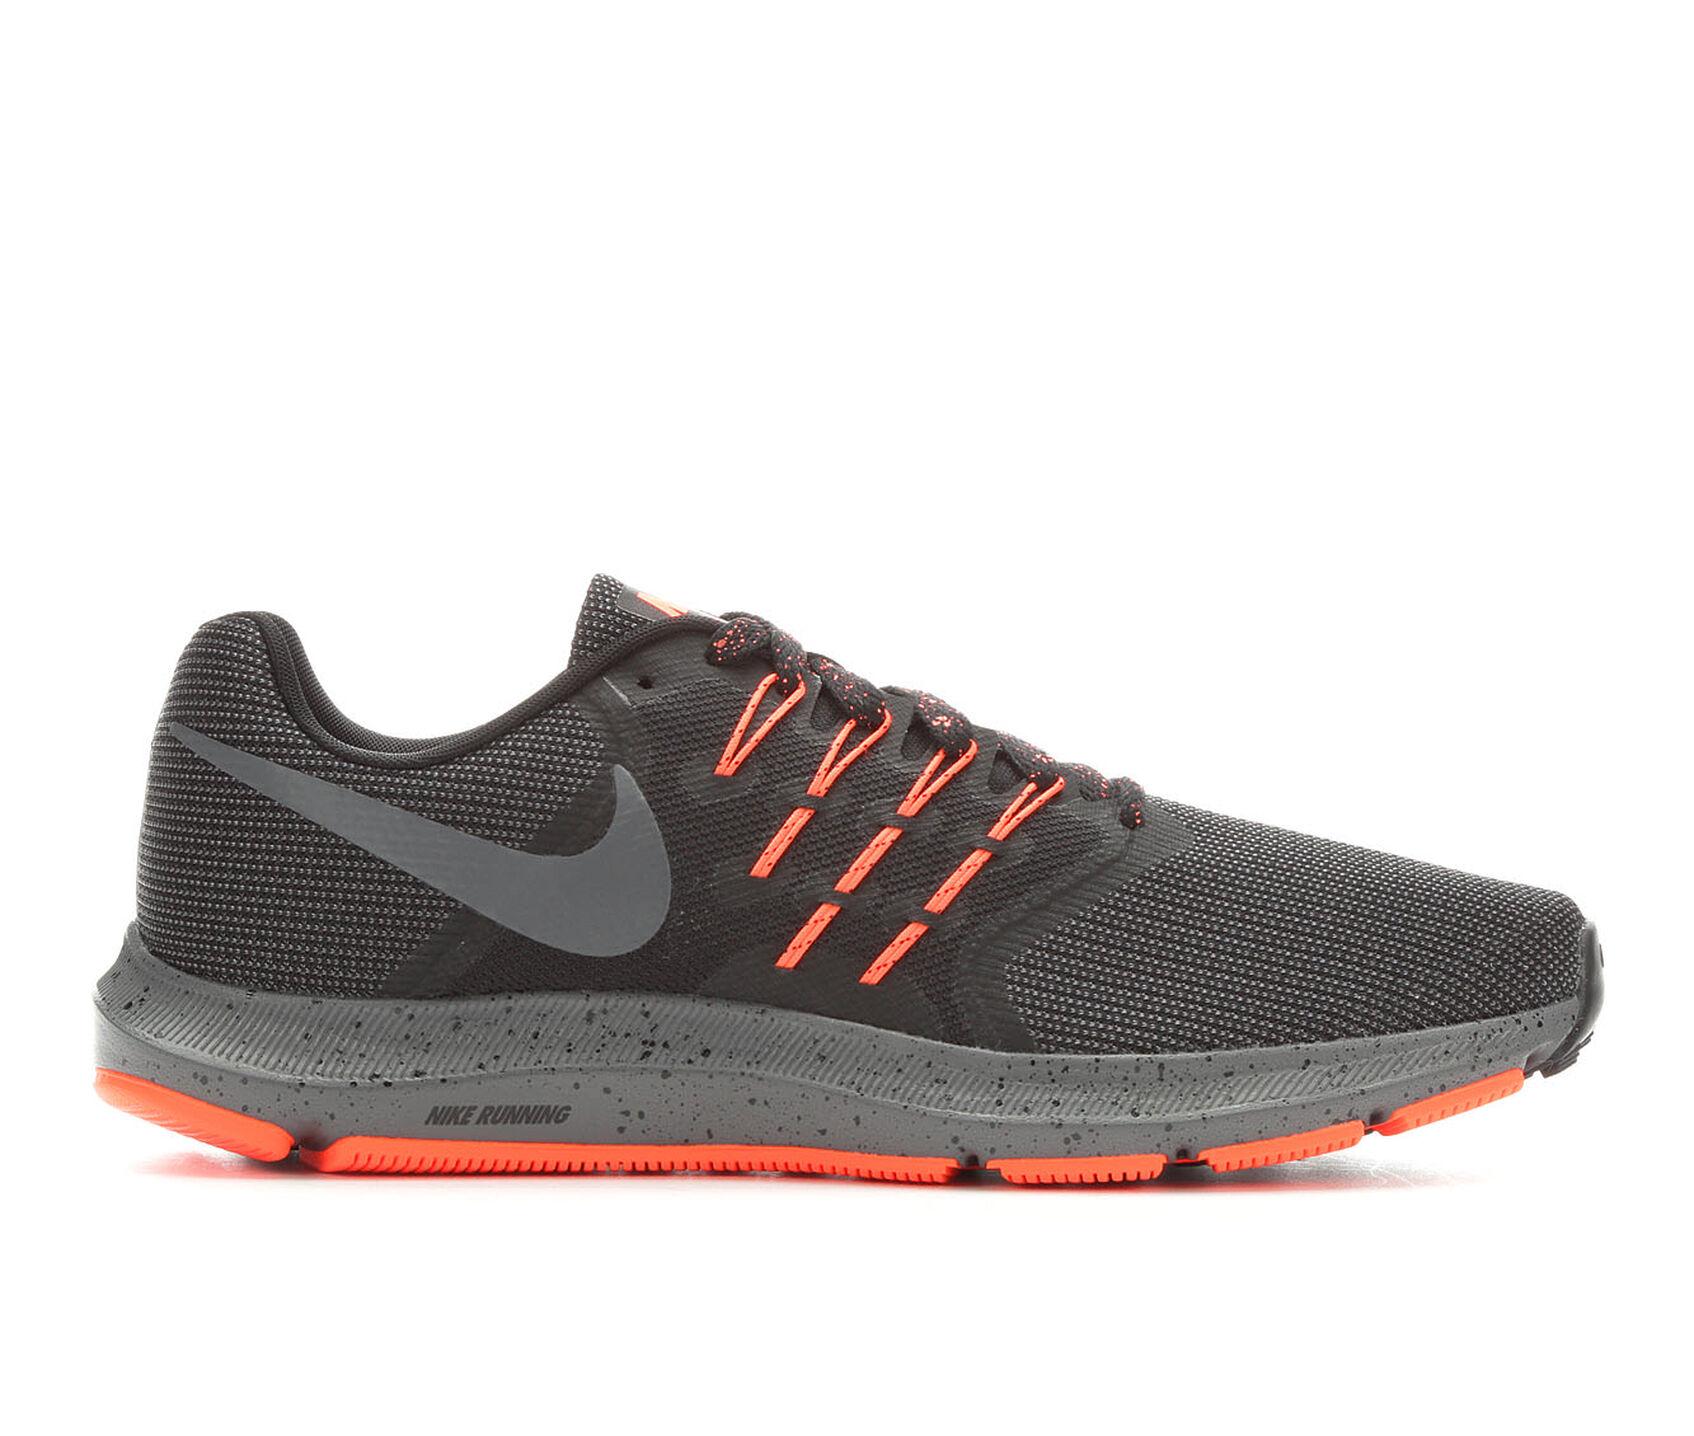 Men's Nike Swift SE Running Shoes | Shoe Carnival